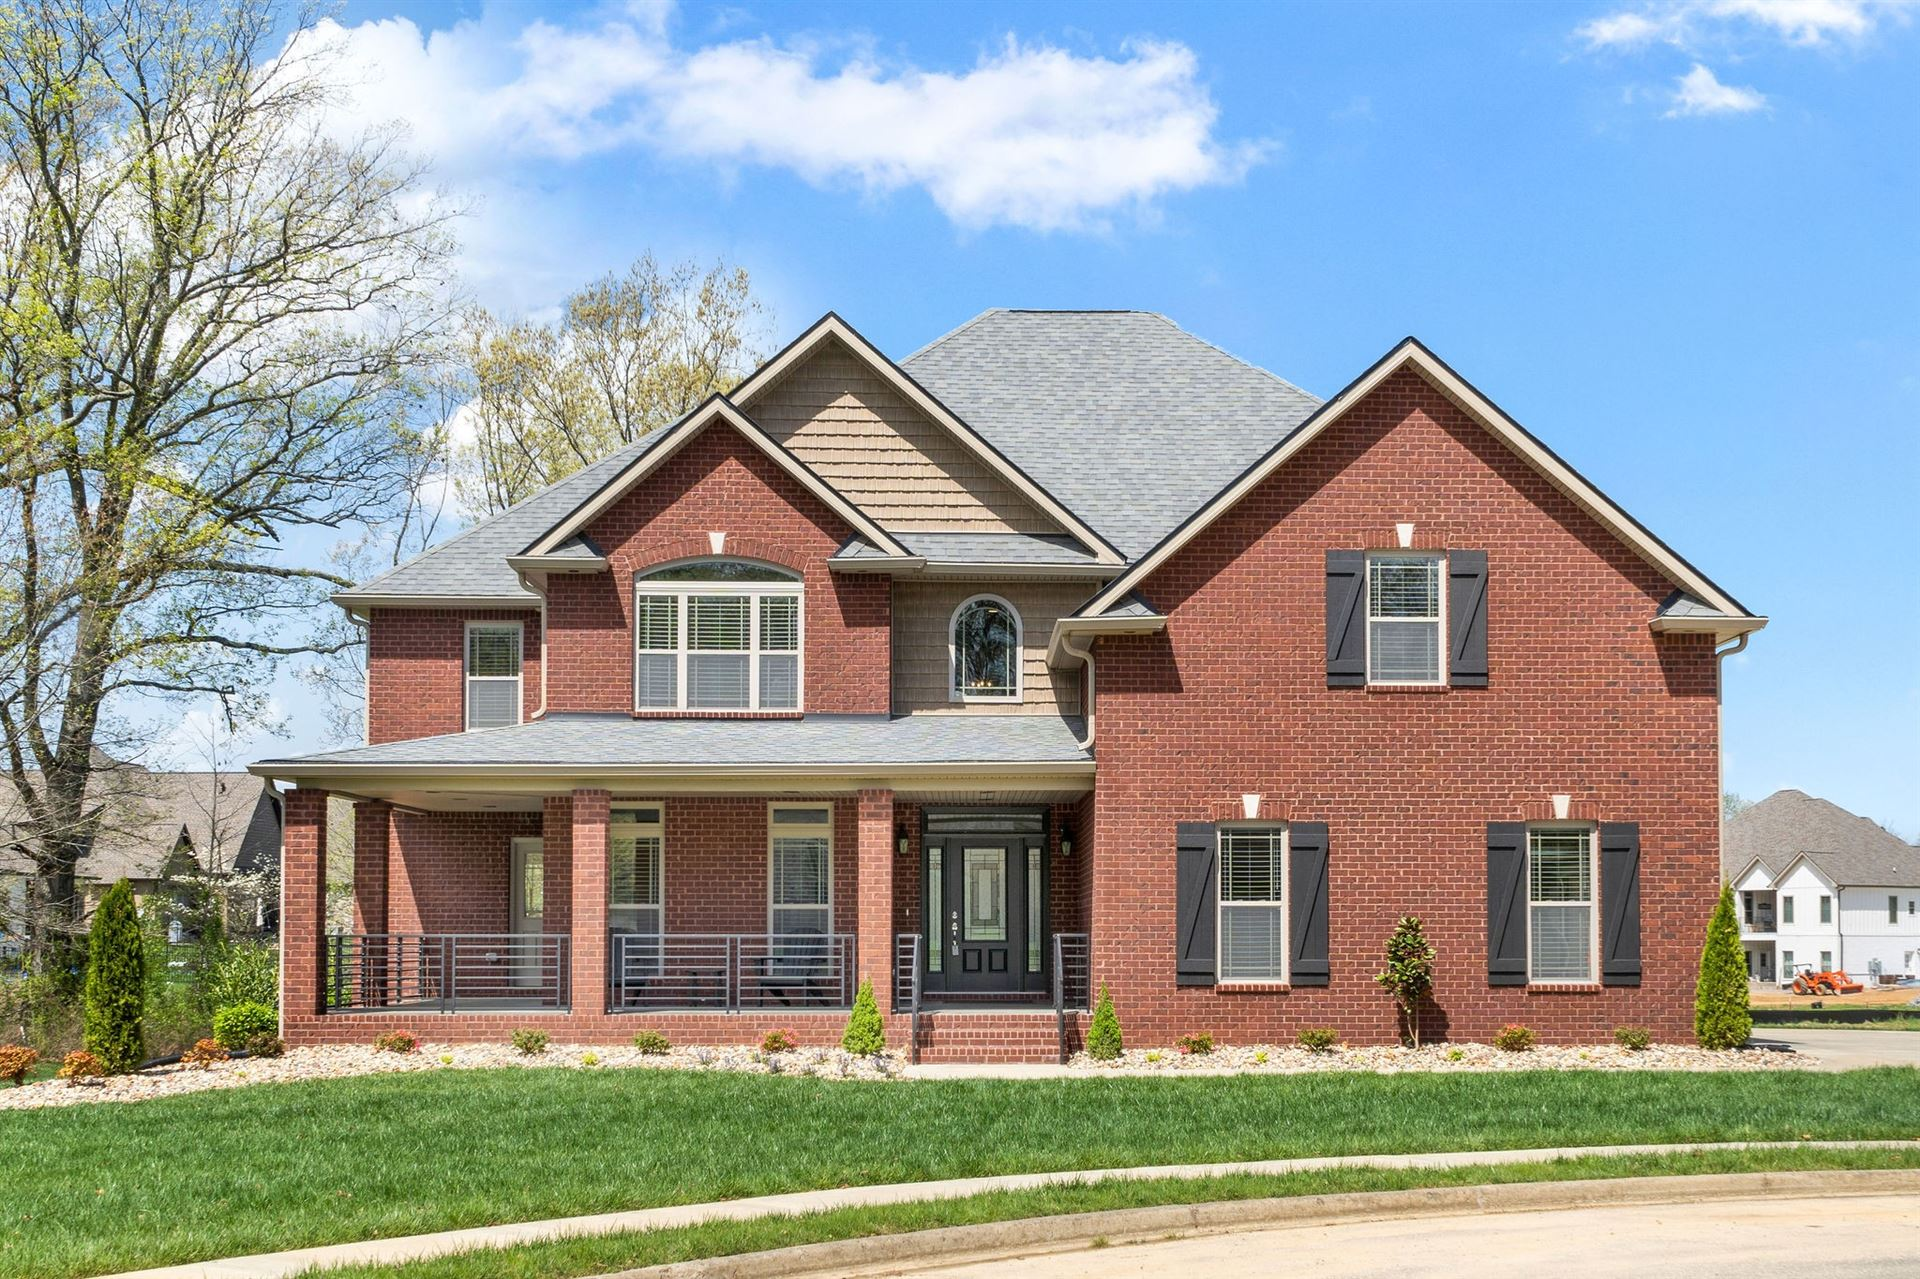 Photo of 305 Bryson Ln, Clarksville, TN 37043 (MLS # 2243500)